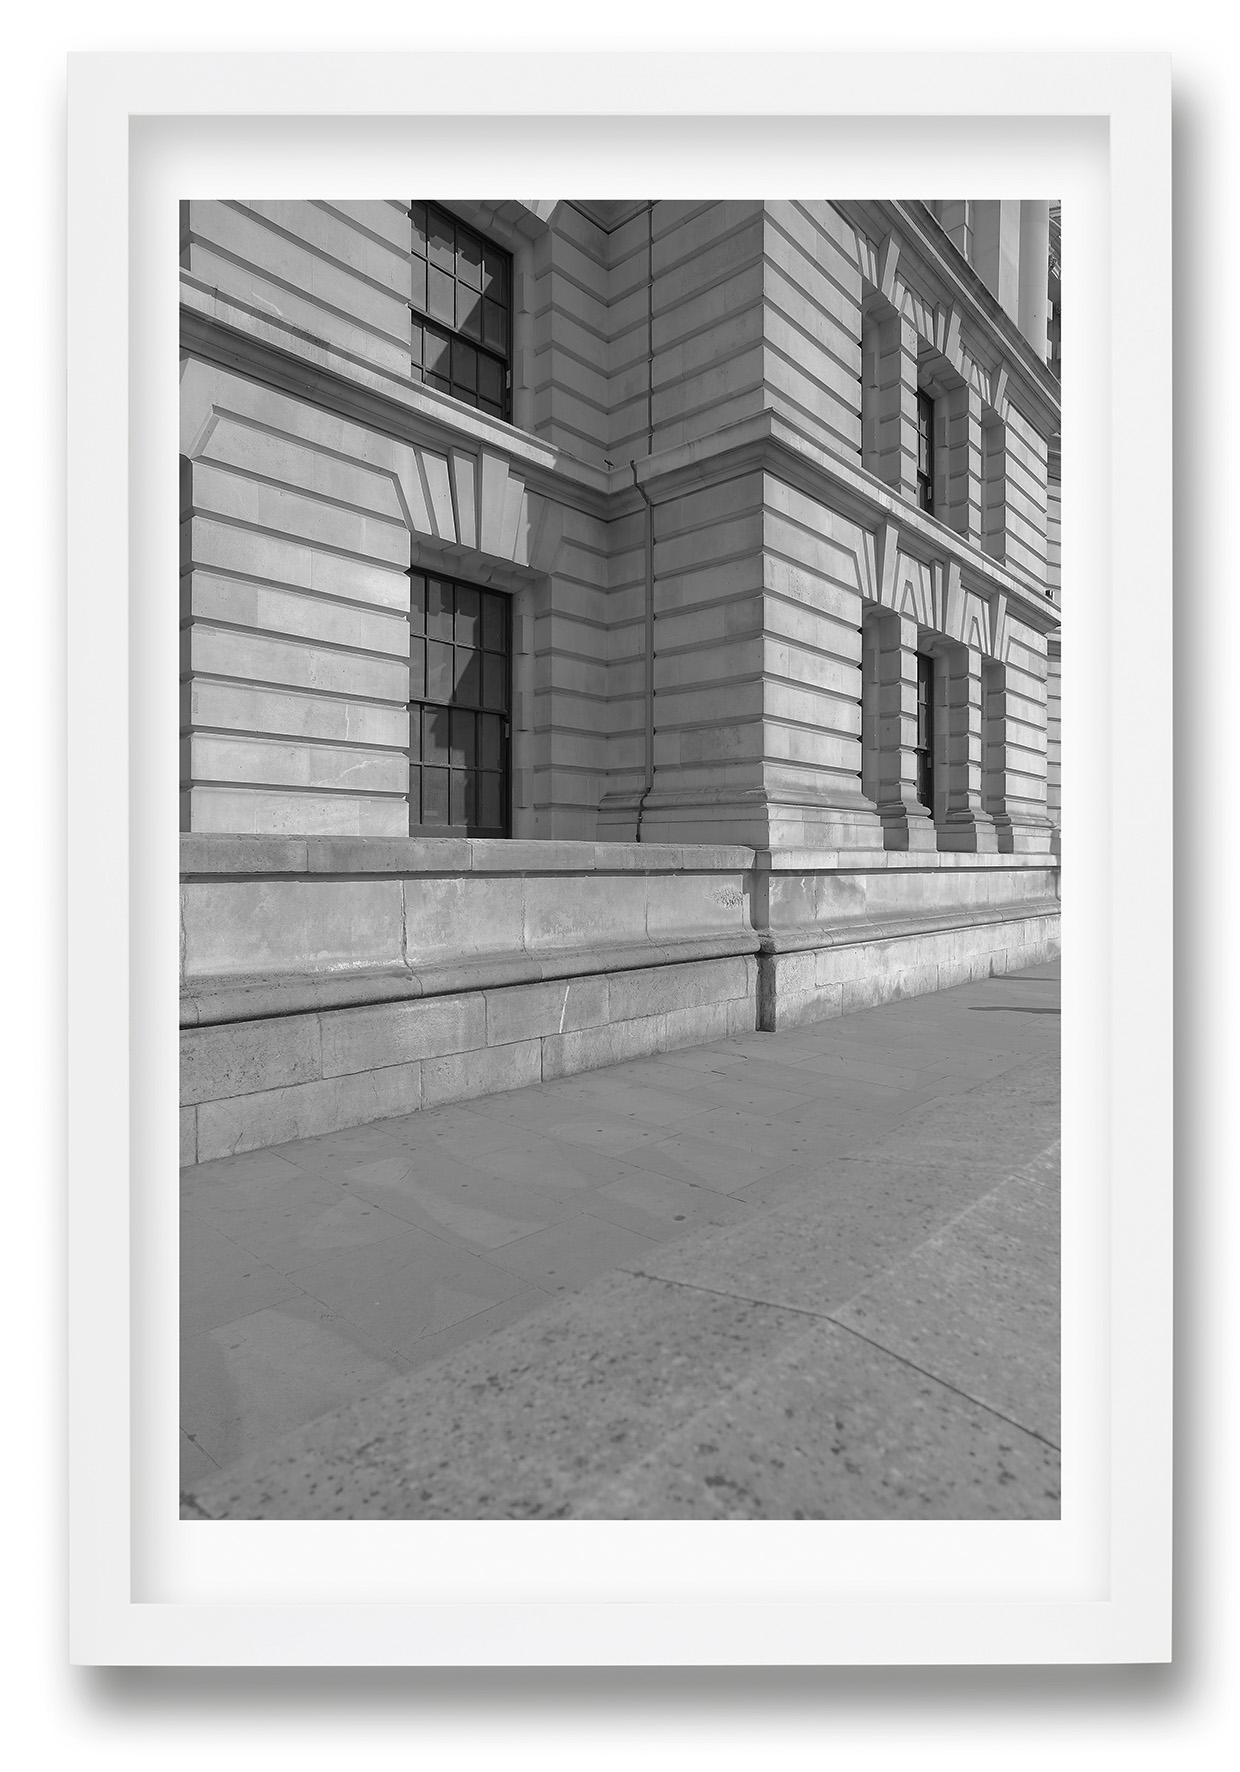 Rahmen_100x150_Hochformat_London_28_8_2019_135